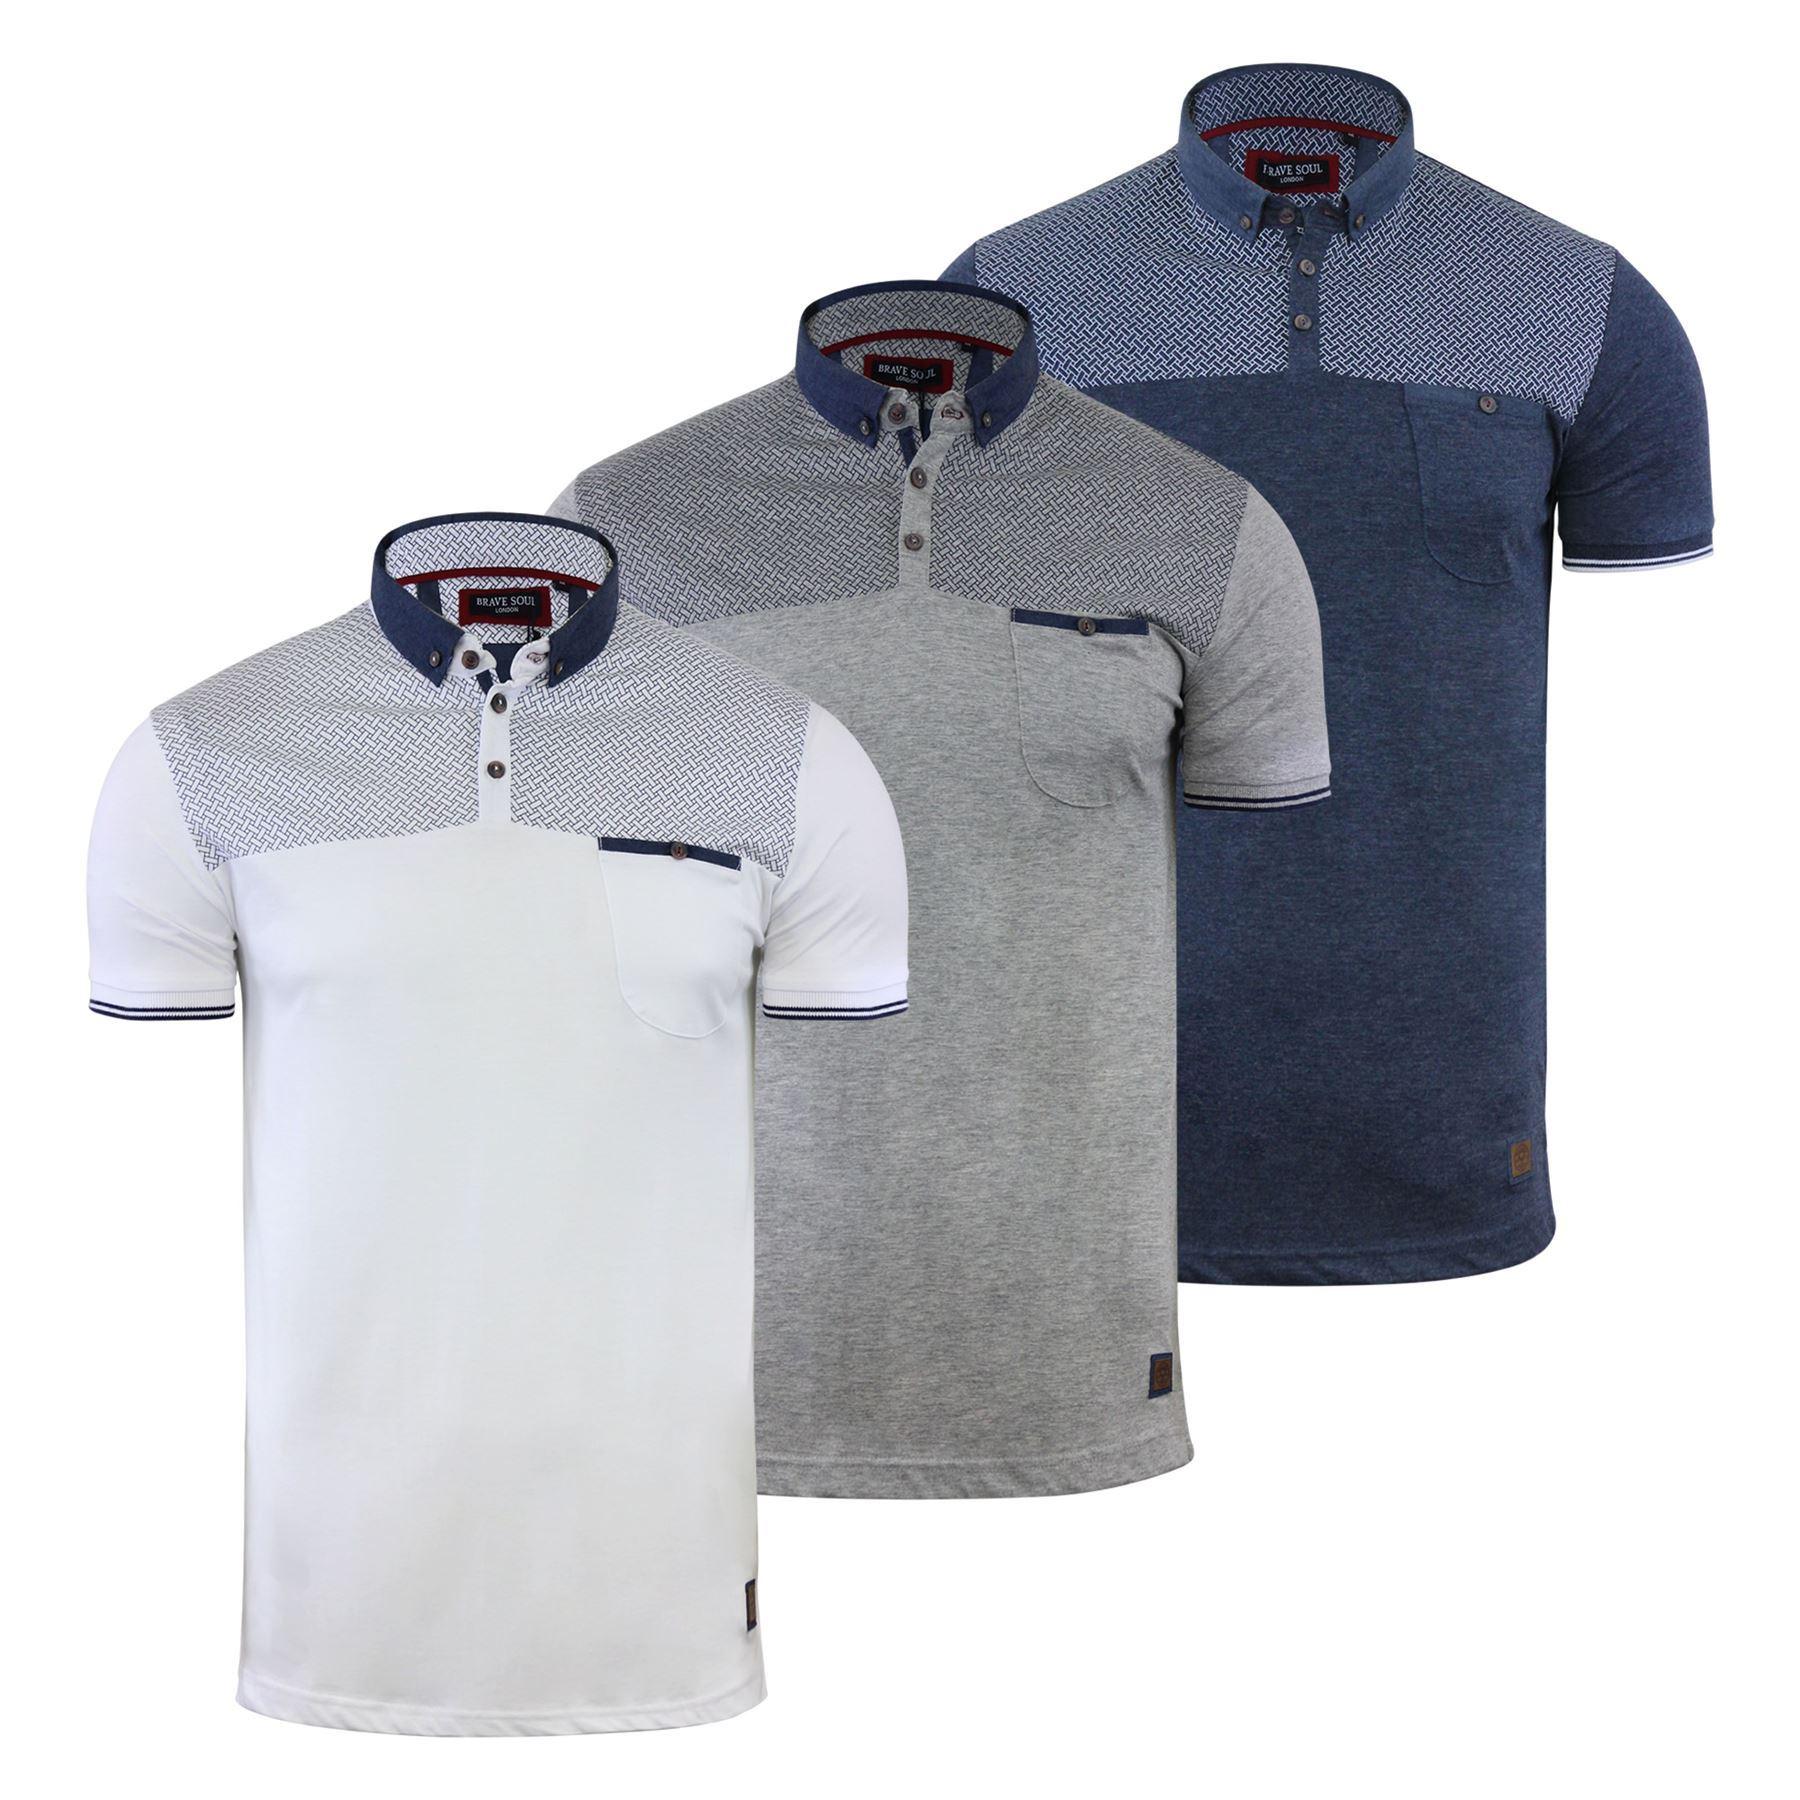 Mens Polo T Shirt Brave Soul Aqua Printed Short Sleeve Chambray Collar Top